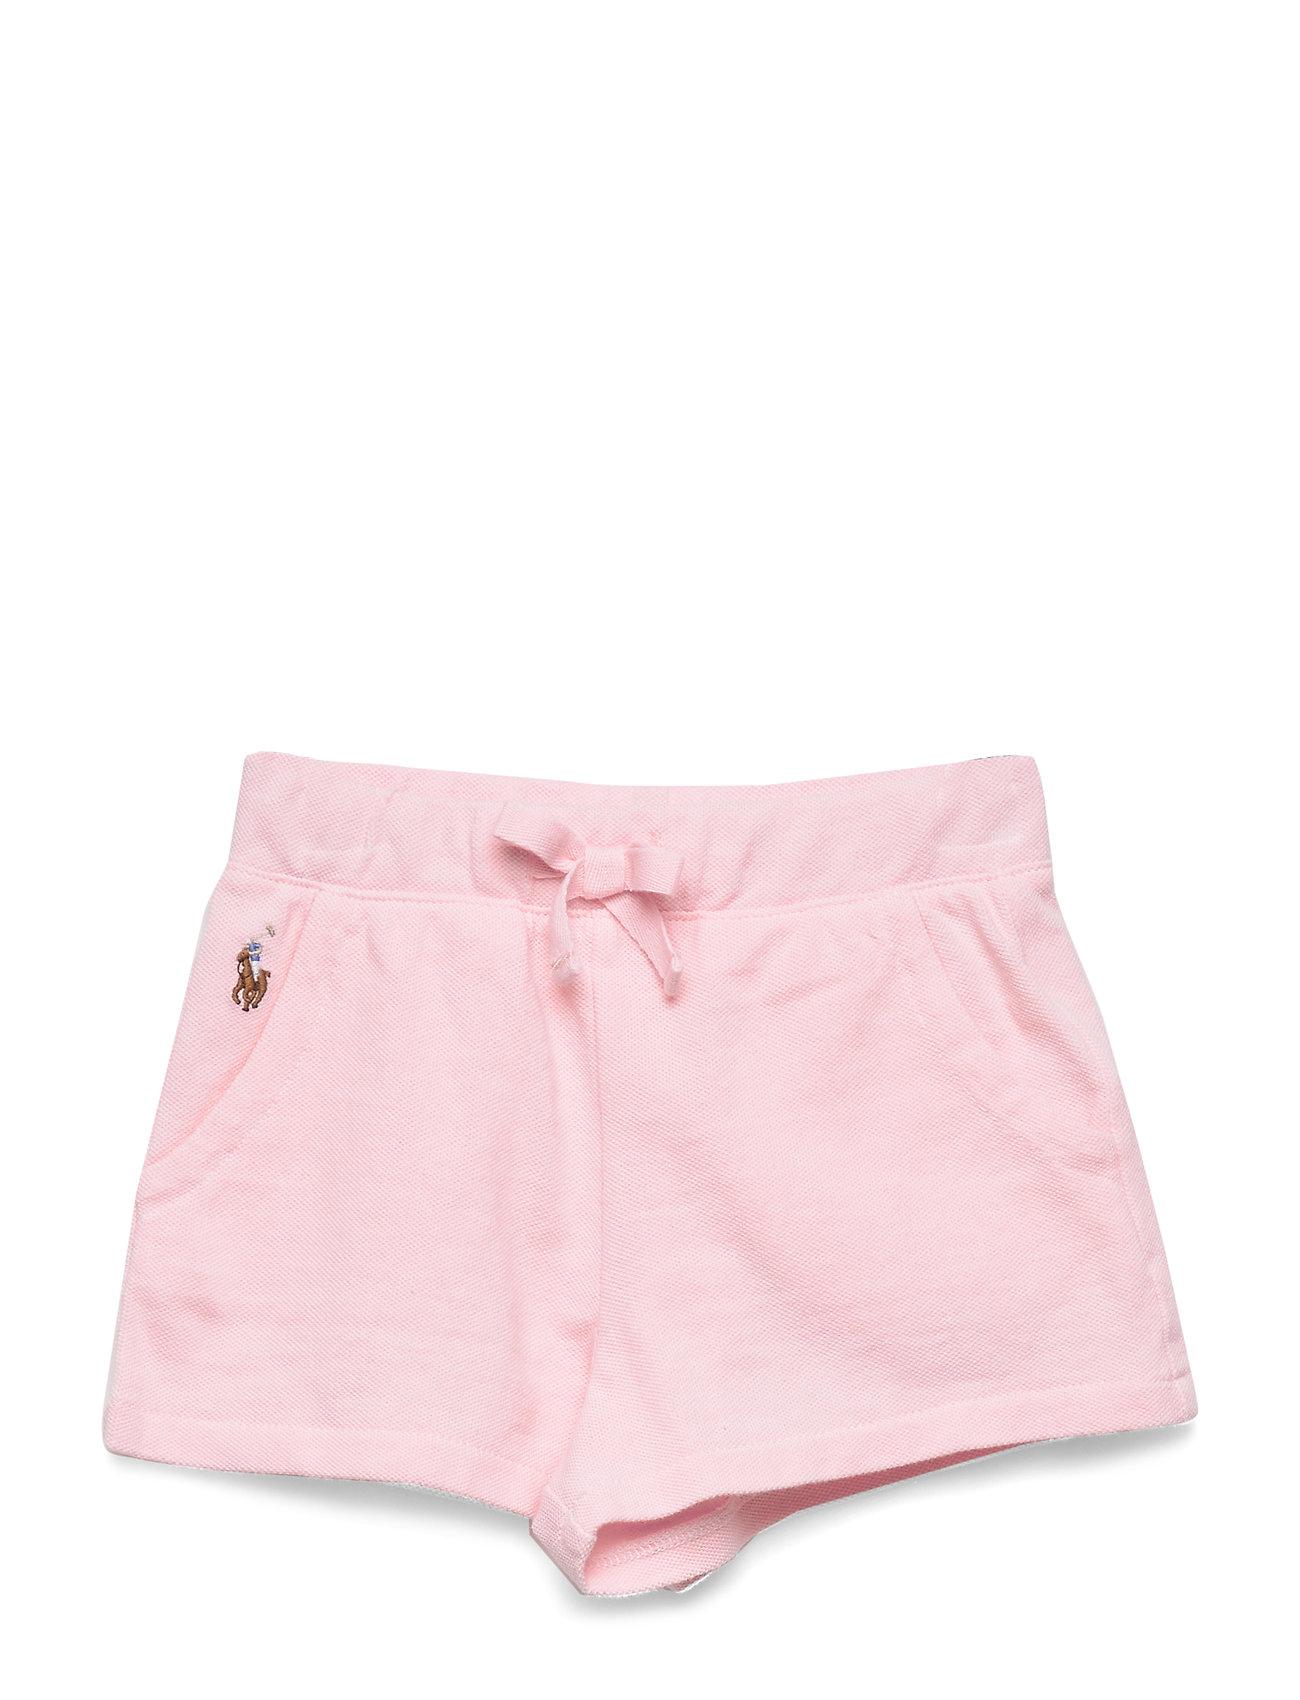 Ralph Lauren Baby French Terry Dress & Bloomer - CARMEL PINK